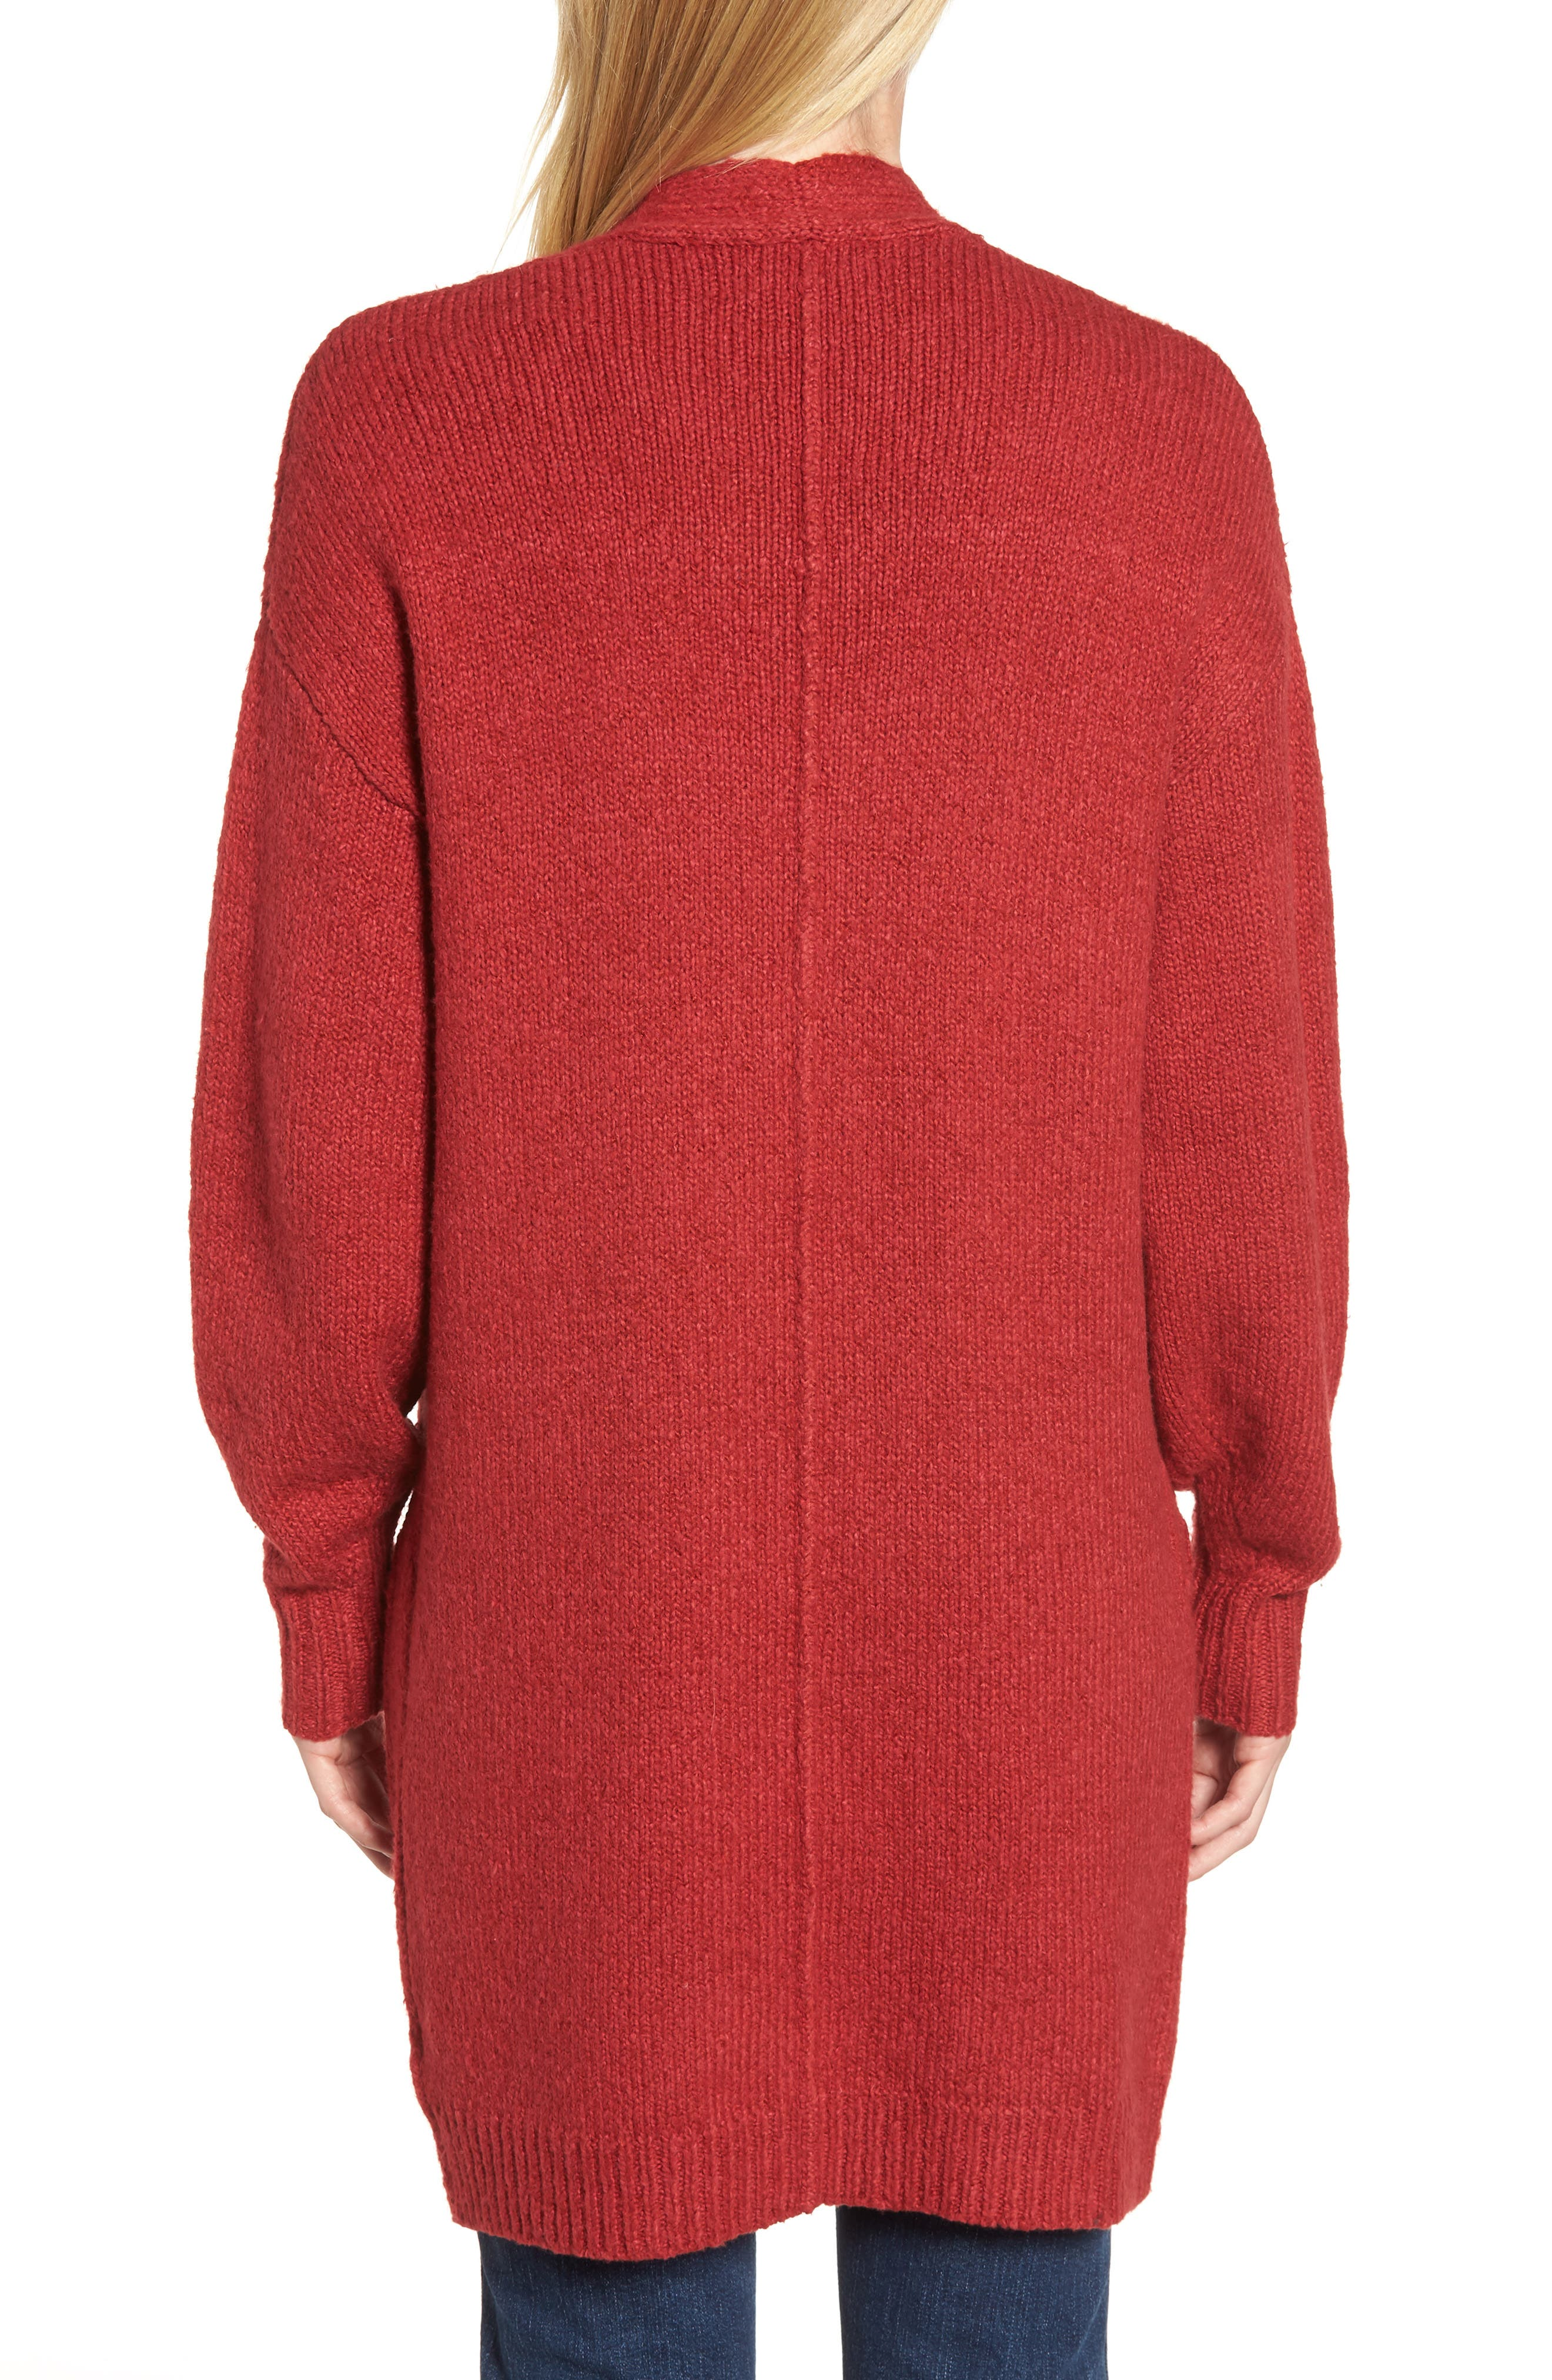 Cotton Blend Cardigan,                             Alternate thumbnail 2, color,                             RED